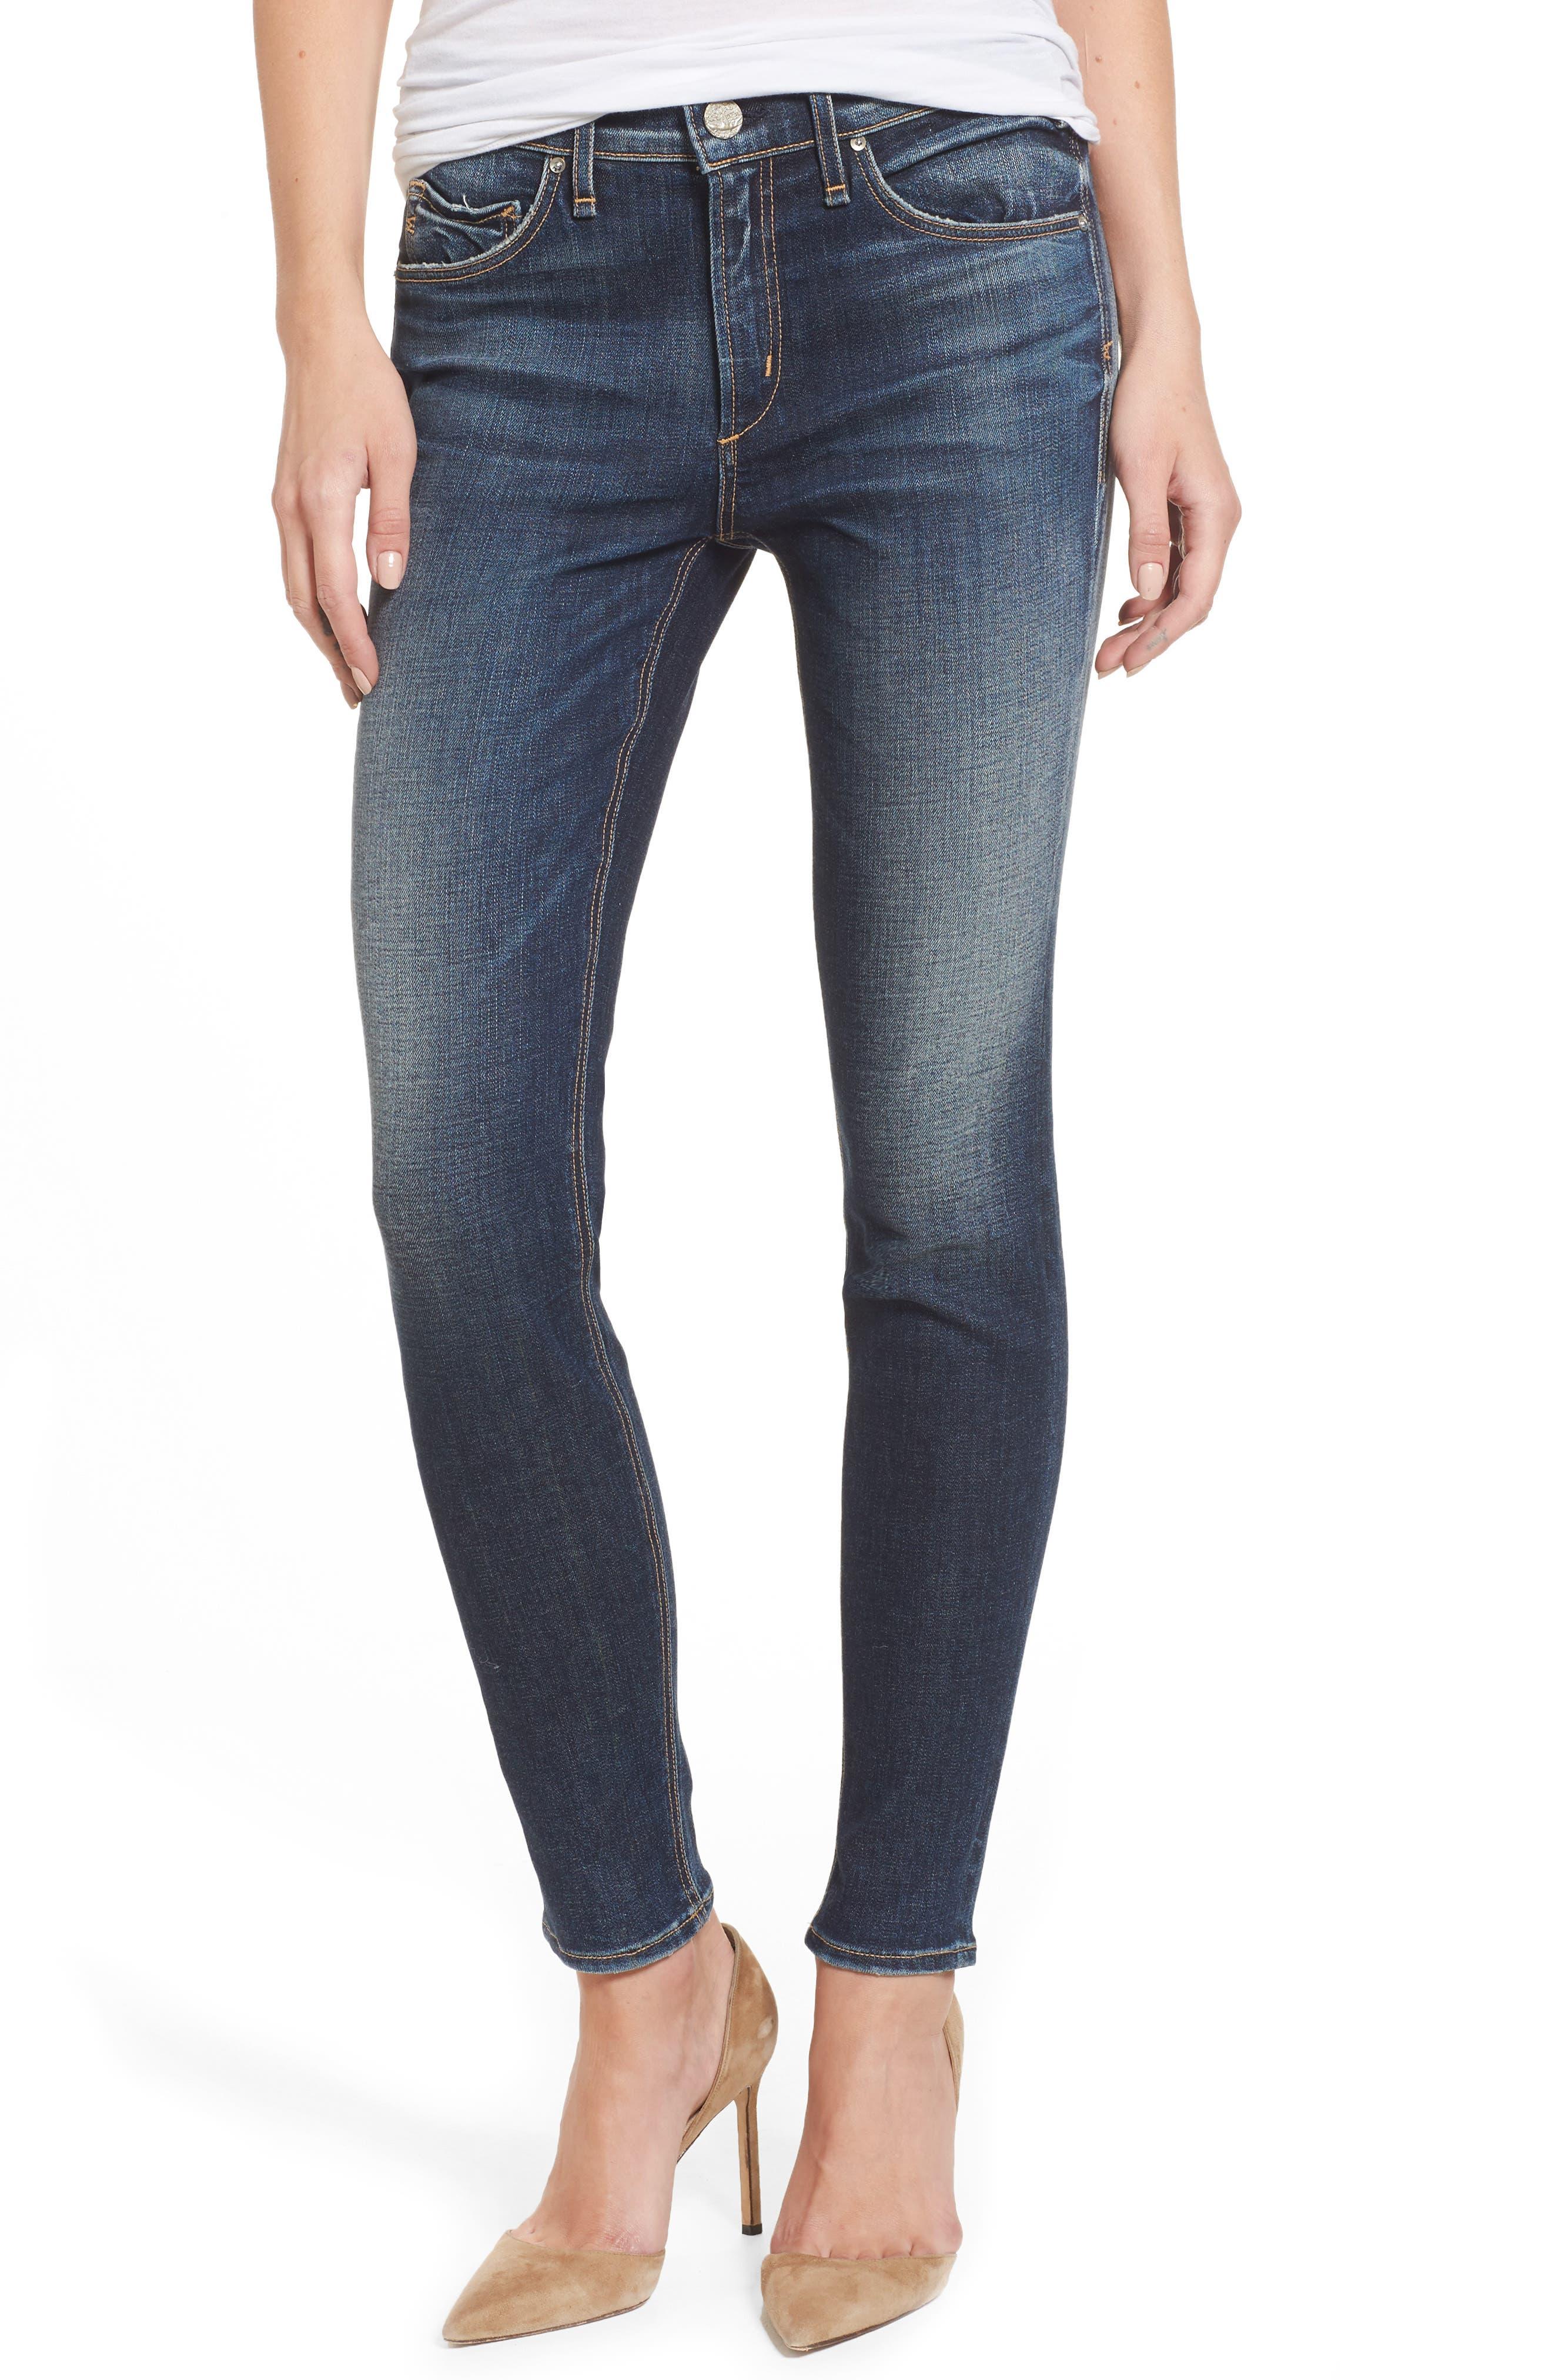 Main Image - McGuire Newton High Waist Skinny Jeans (One Thousand Suns)